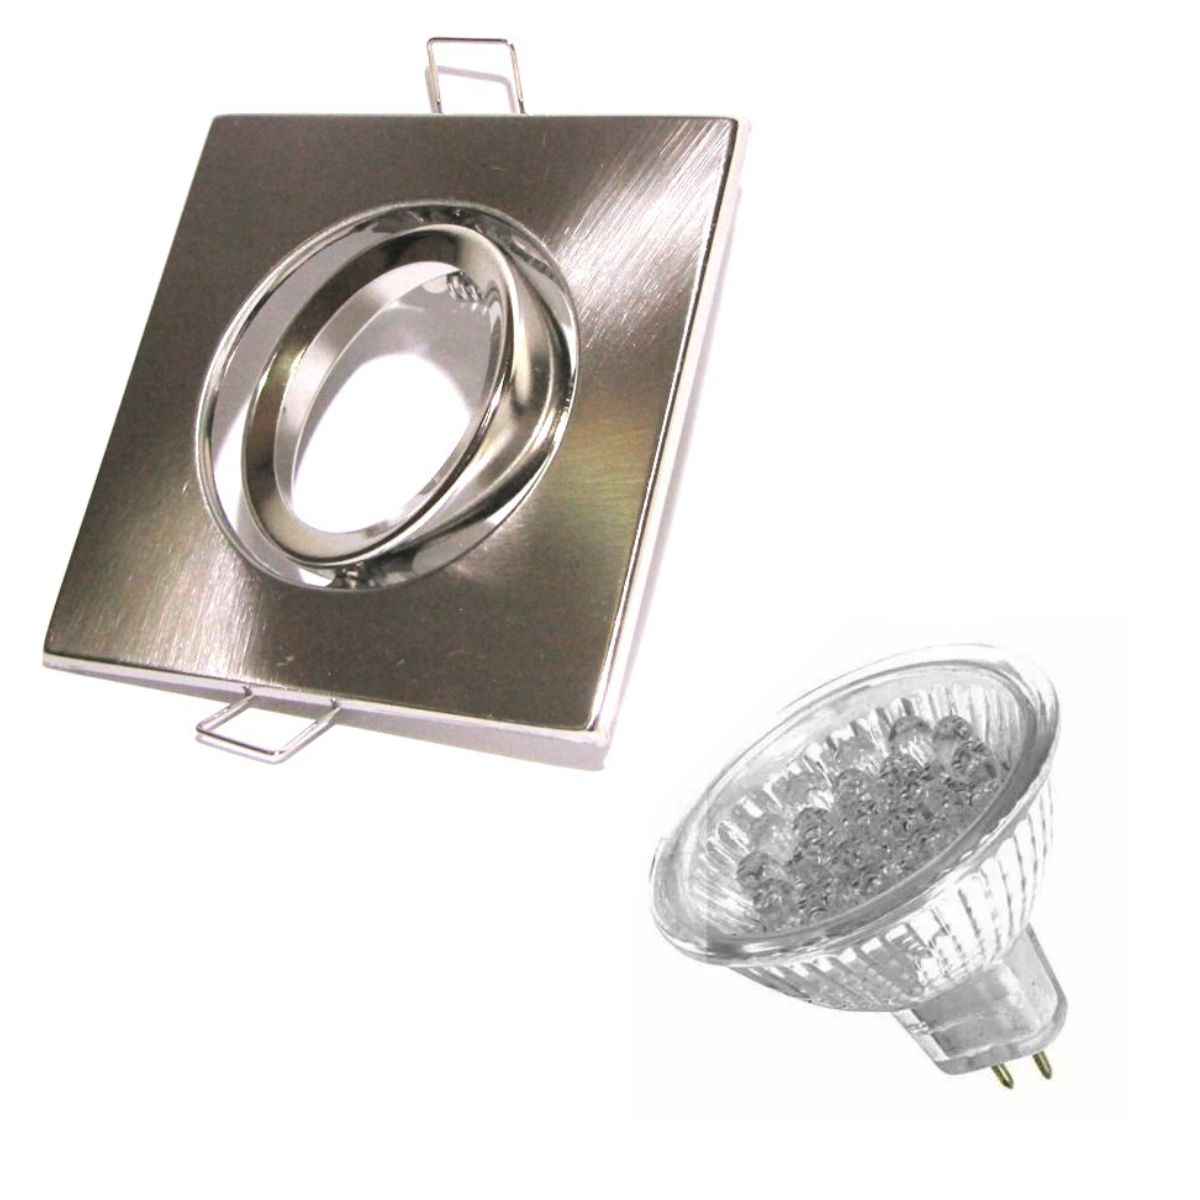 Kit Spot Quadrado Prata + Lâmpada 12 LED Branco Puro 110v MR16